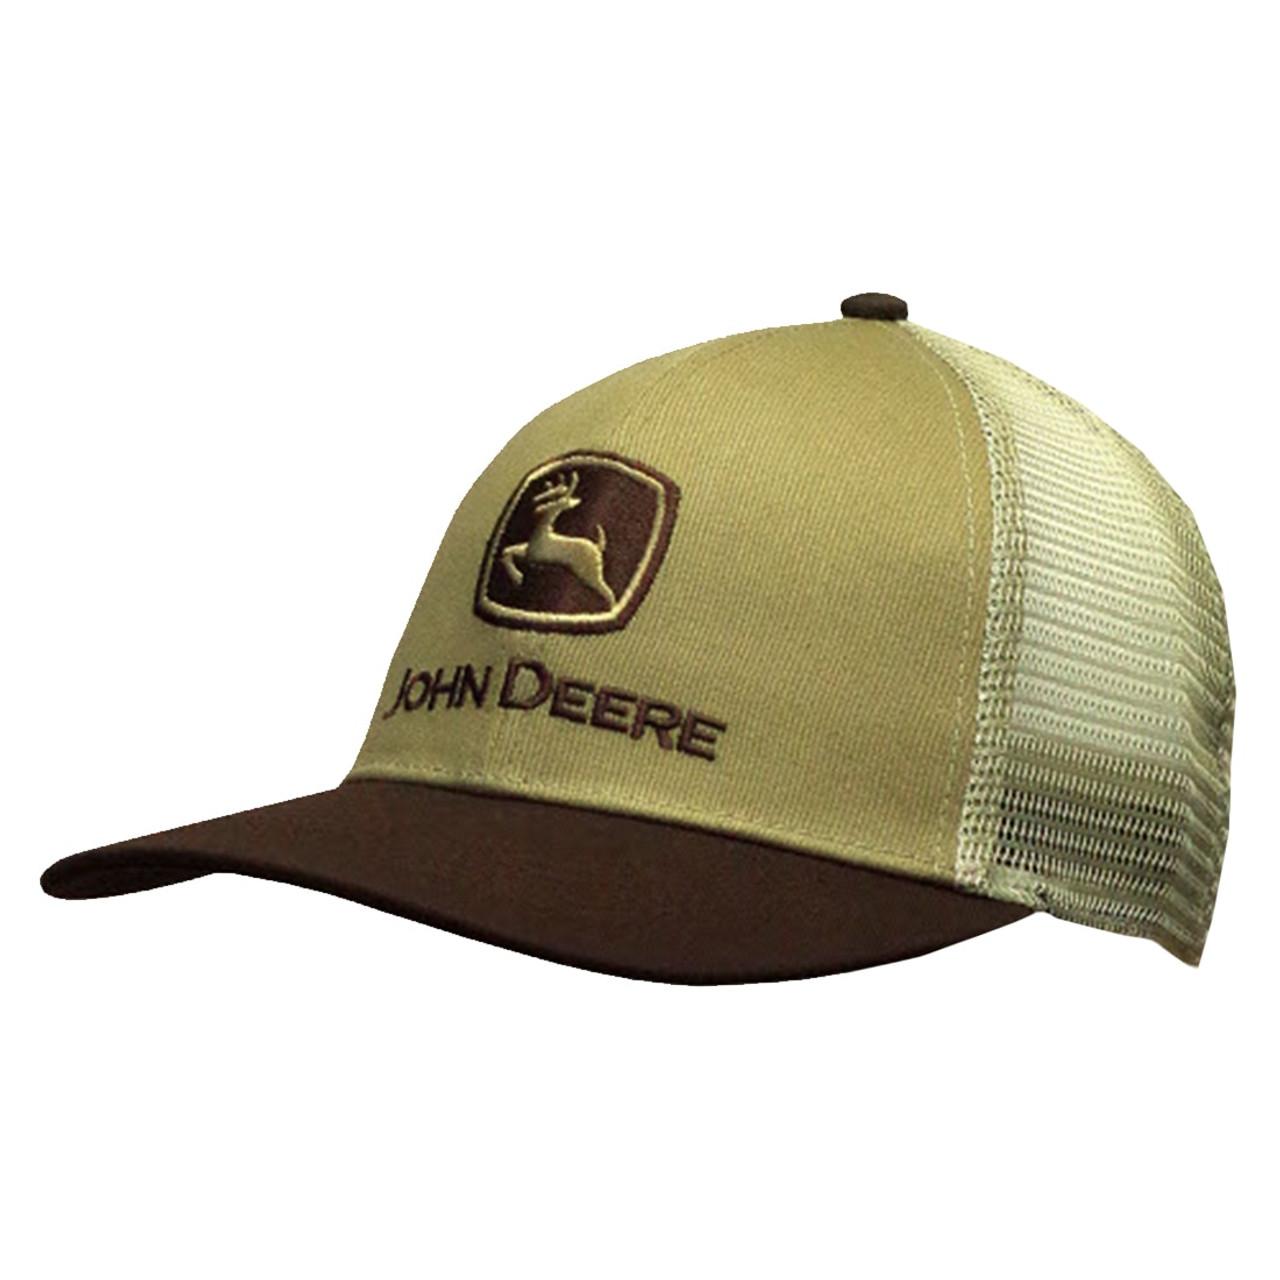 9fcefce6035 John Deere Old School Mesh Trucker Style Hat - Trenz Shirt Company